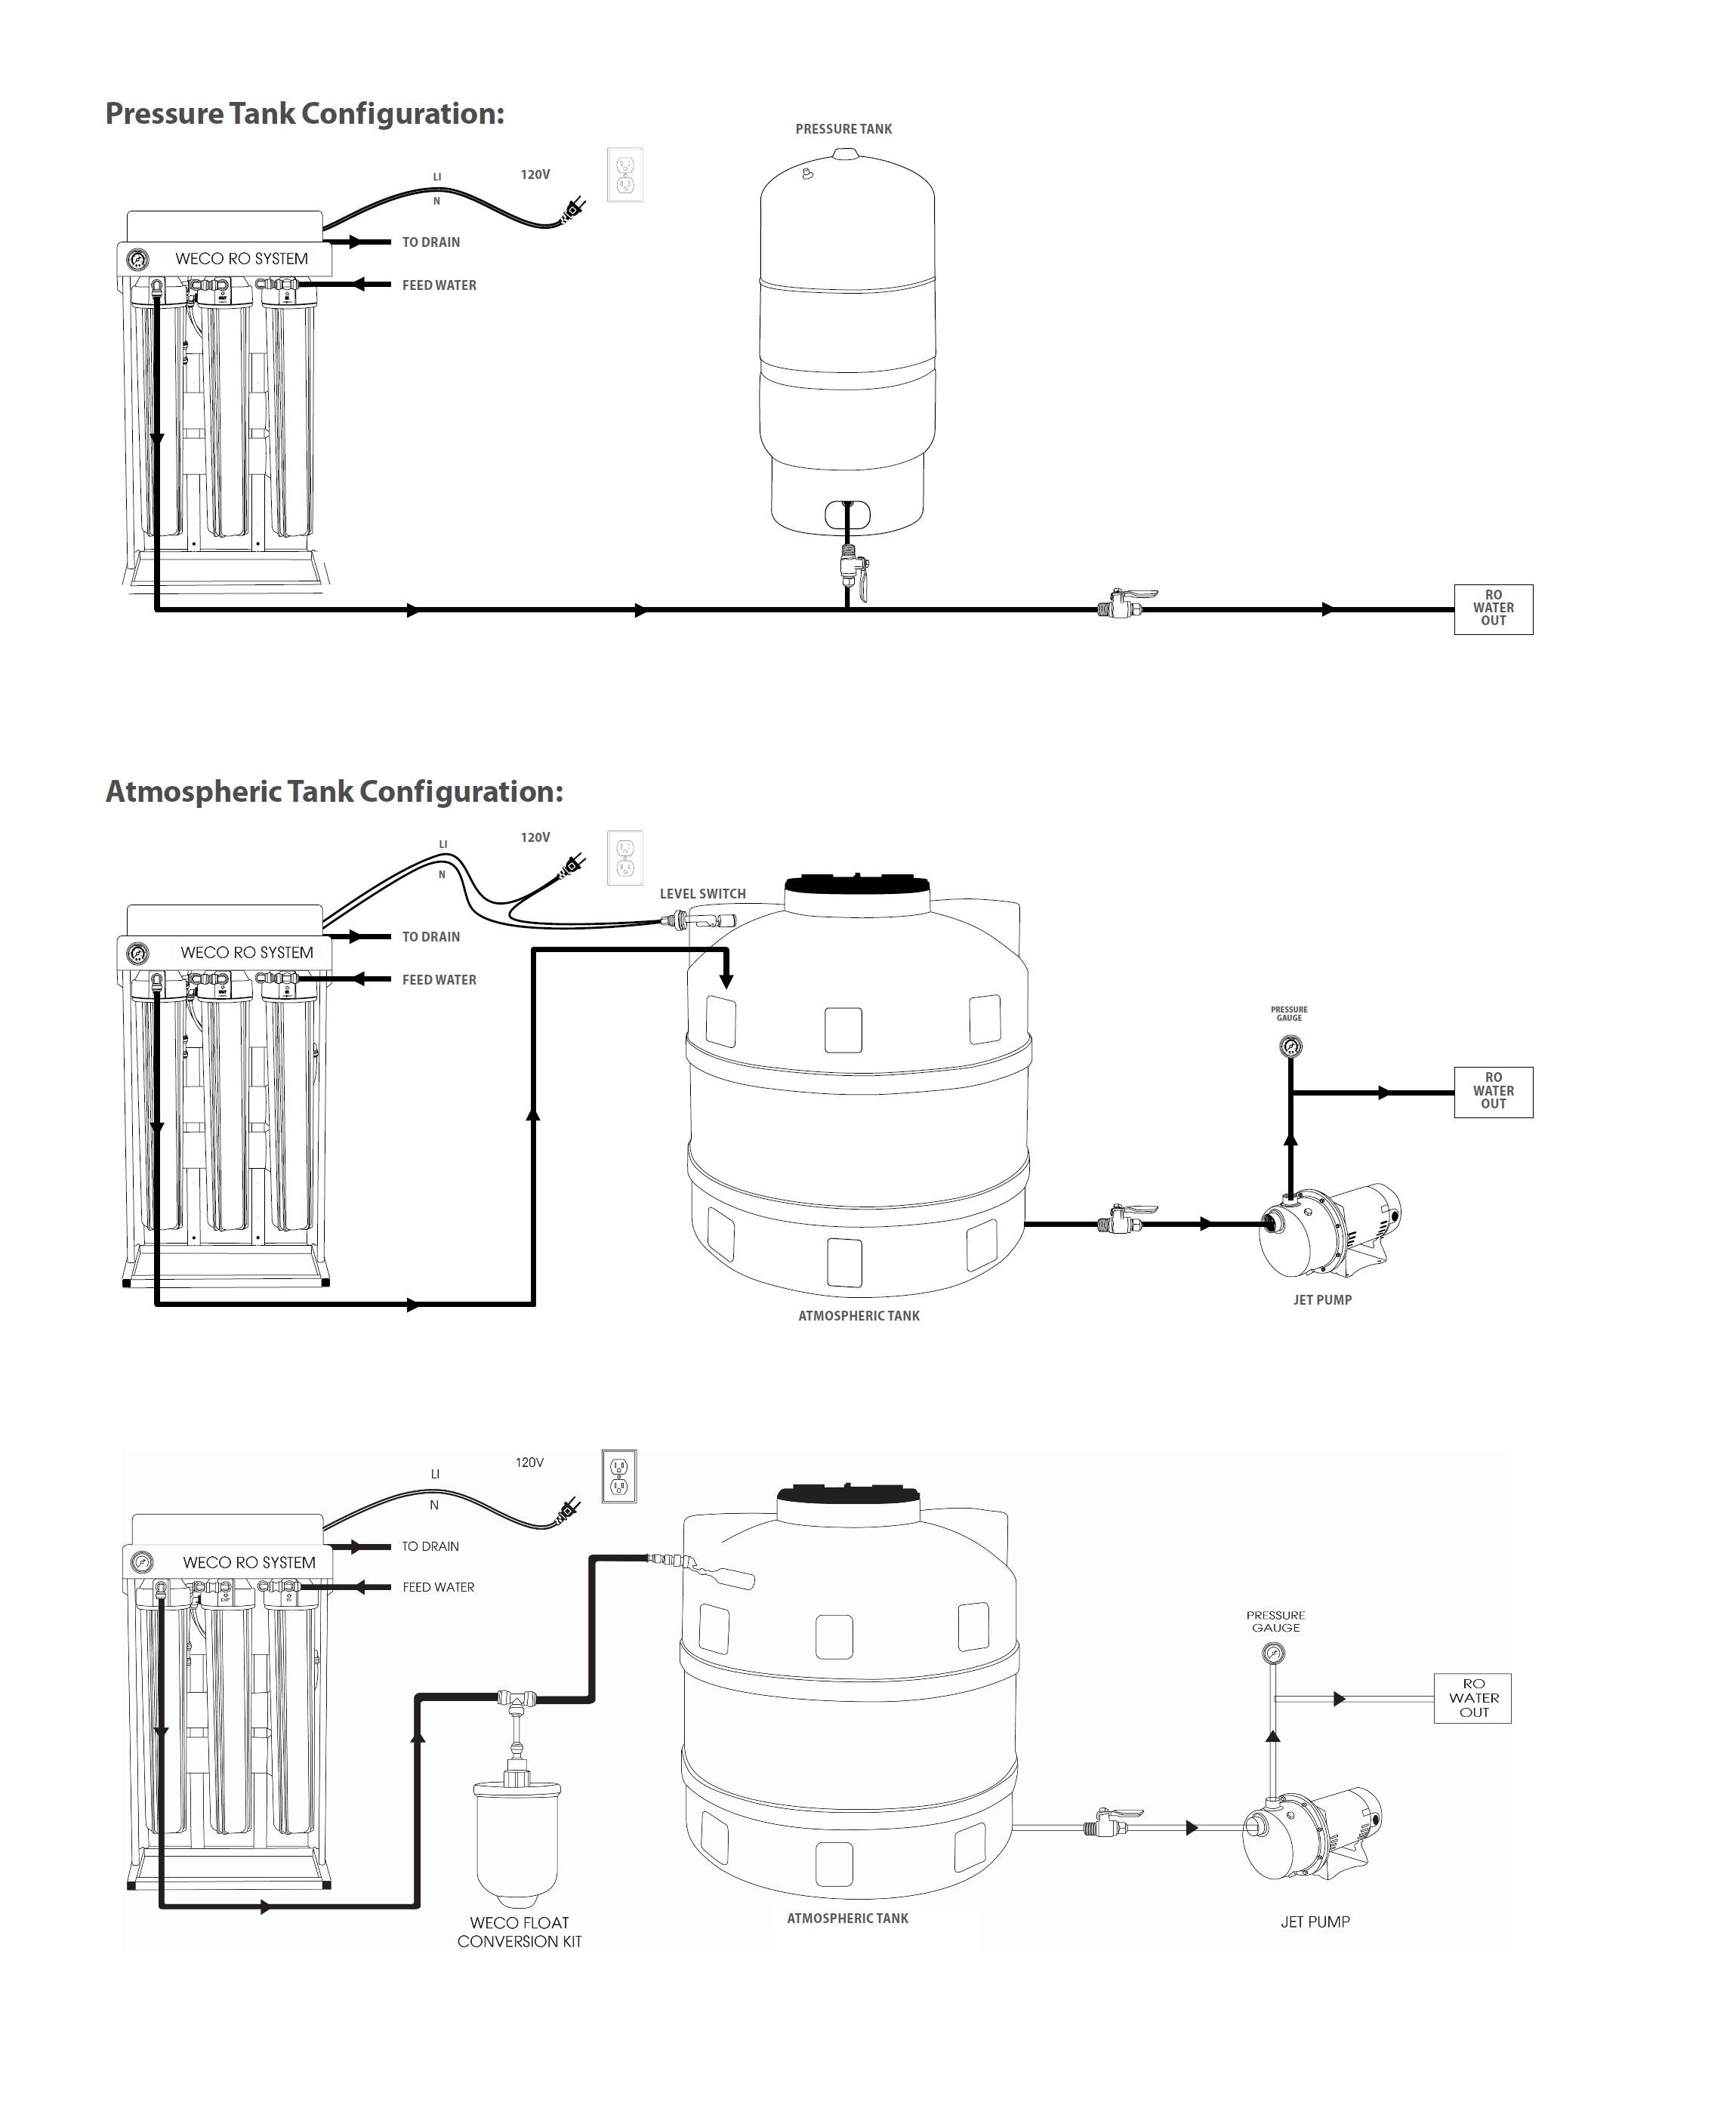 HydroSense RO Residential/Commercial Installation